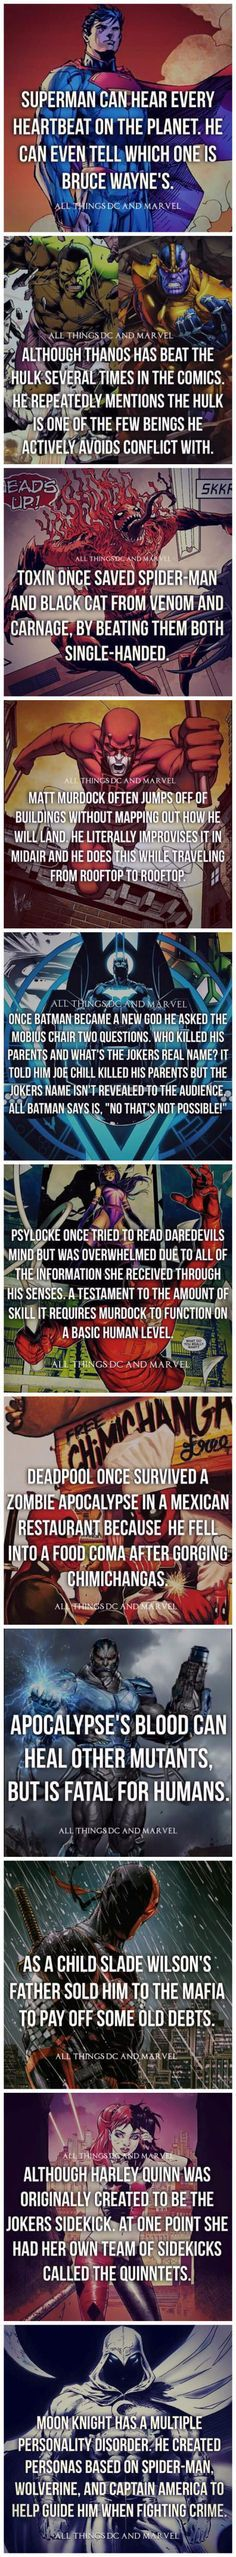 Cool superhero facts. Love stuff like this!